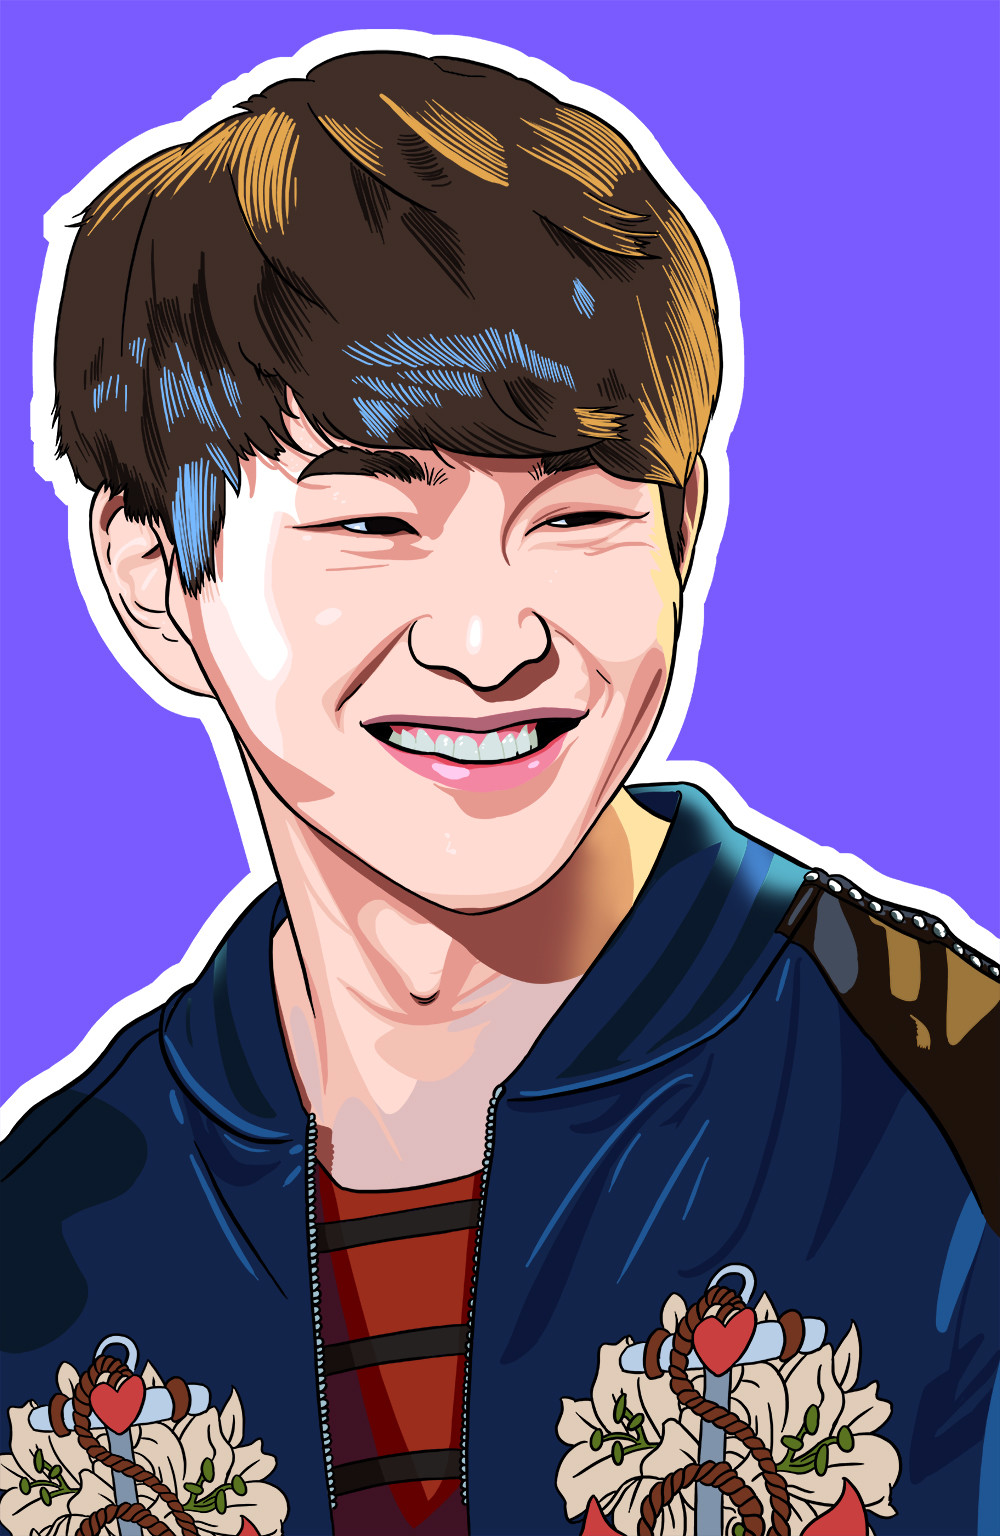 ArtStation - Digital Portrait Of SHINee Leader Onew